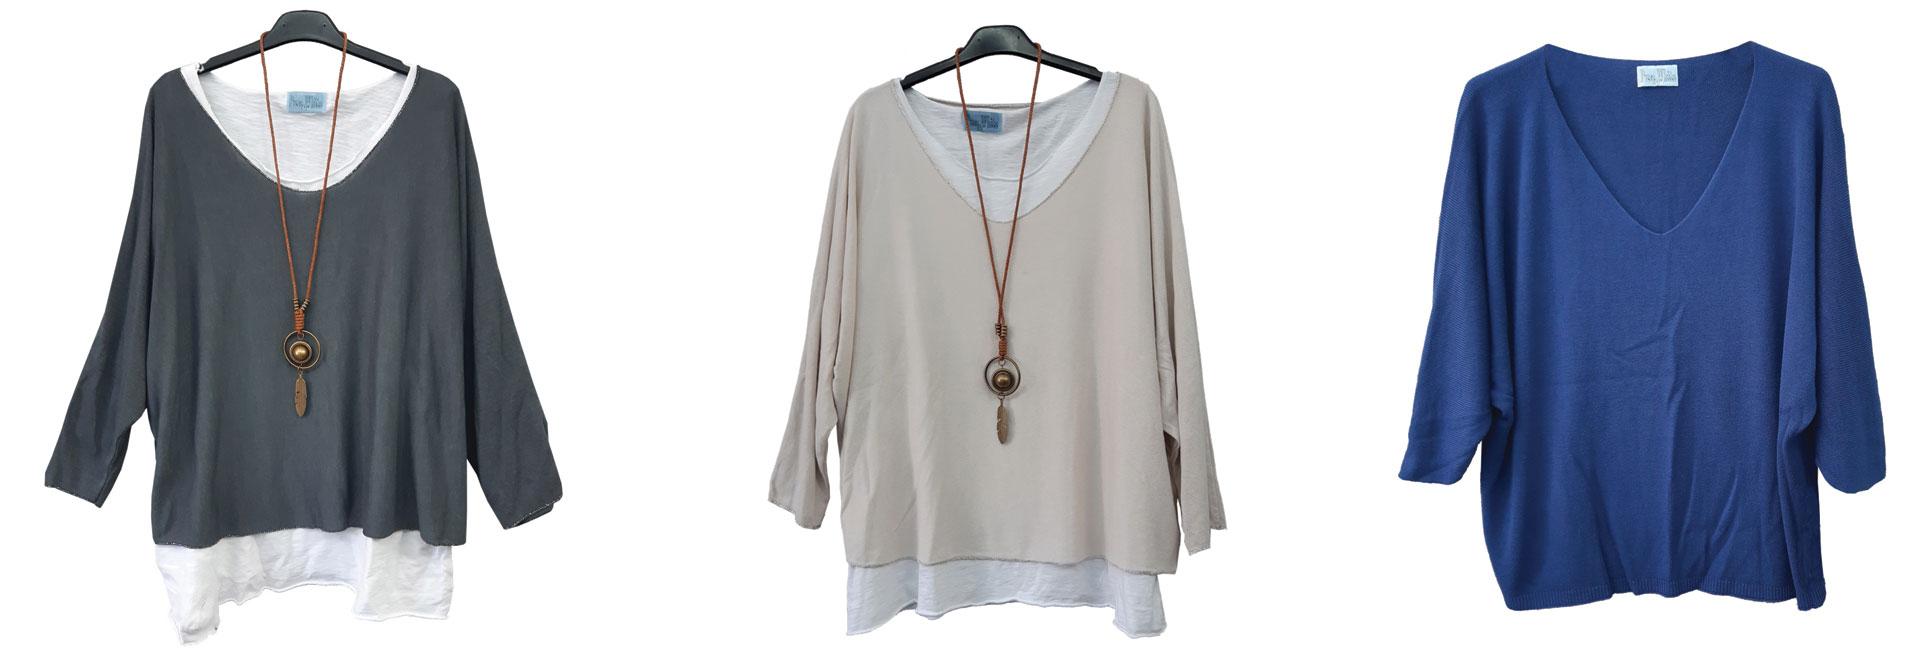 blouses-2